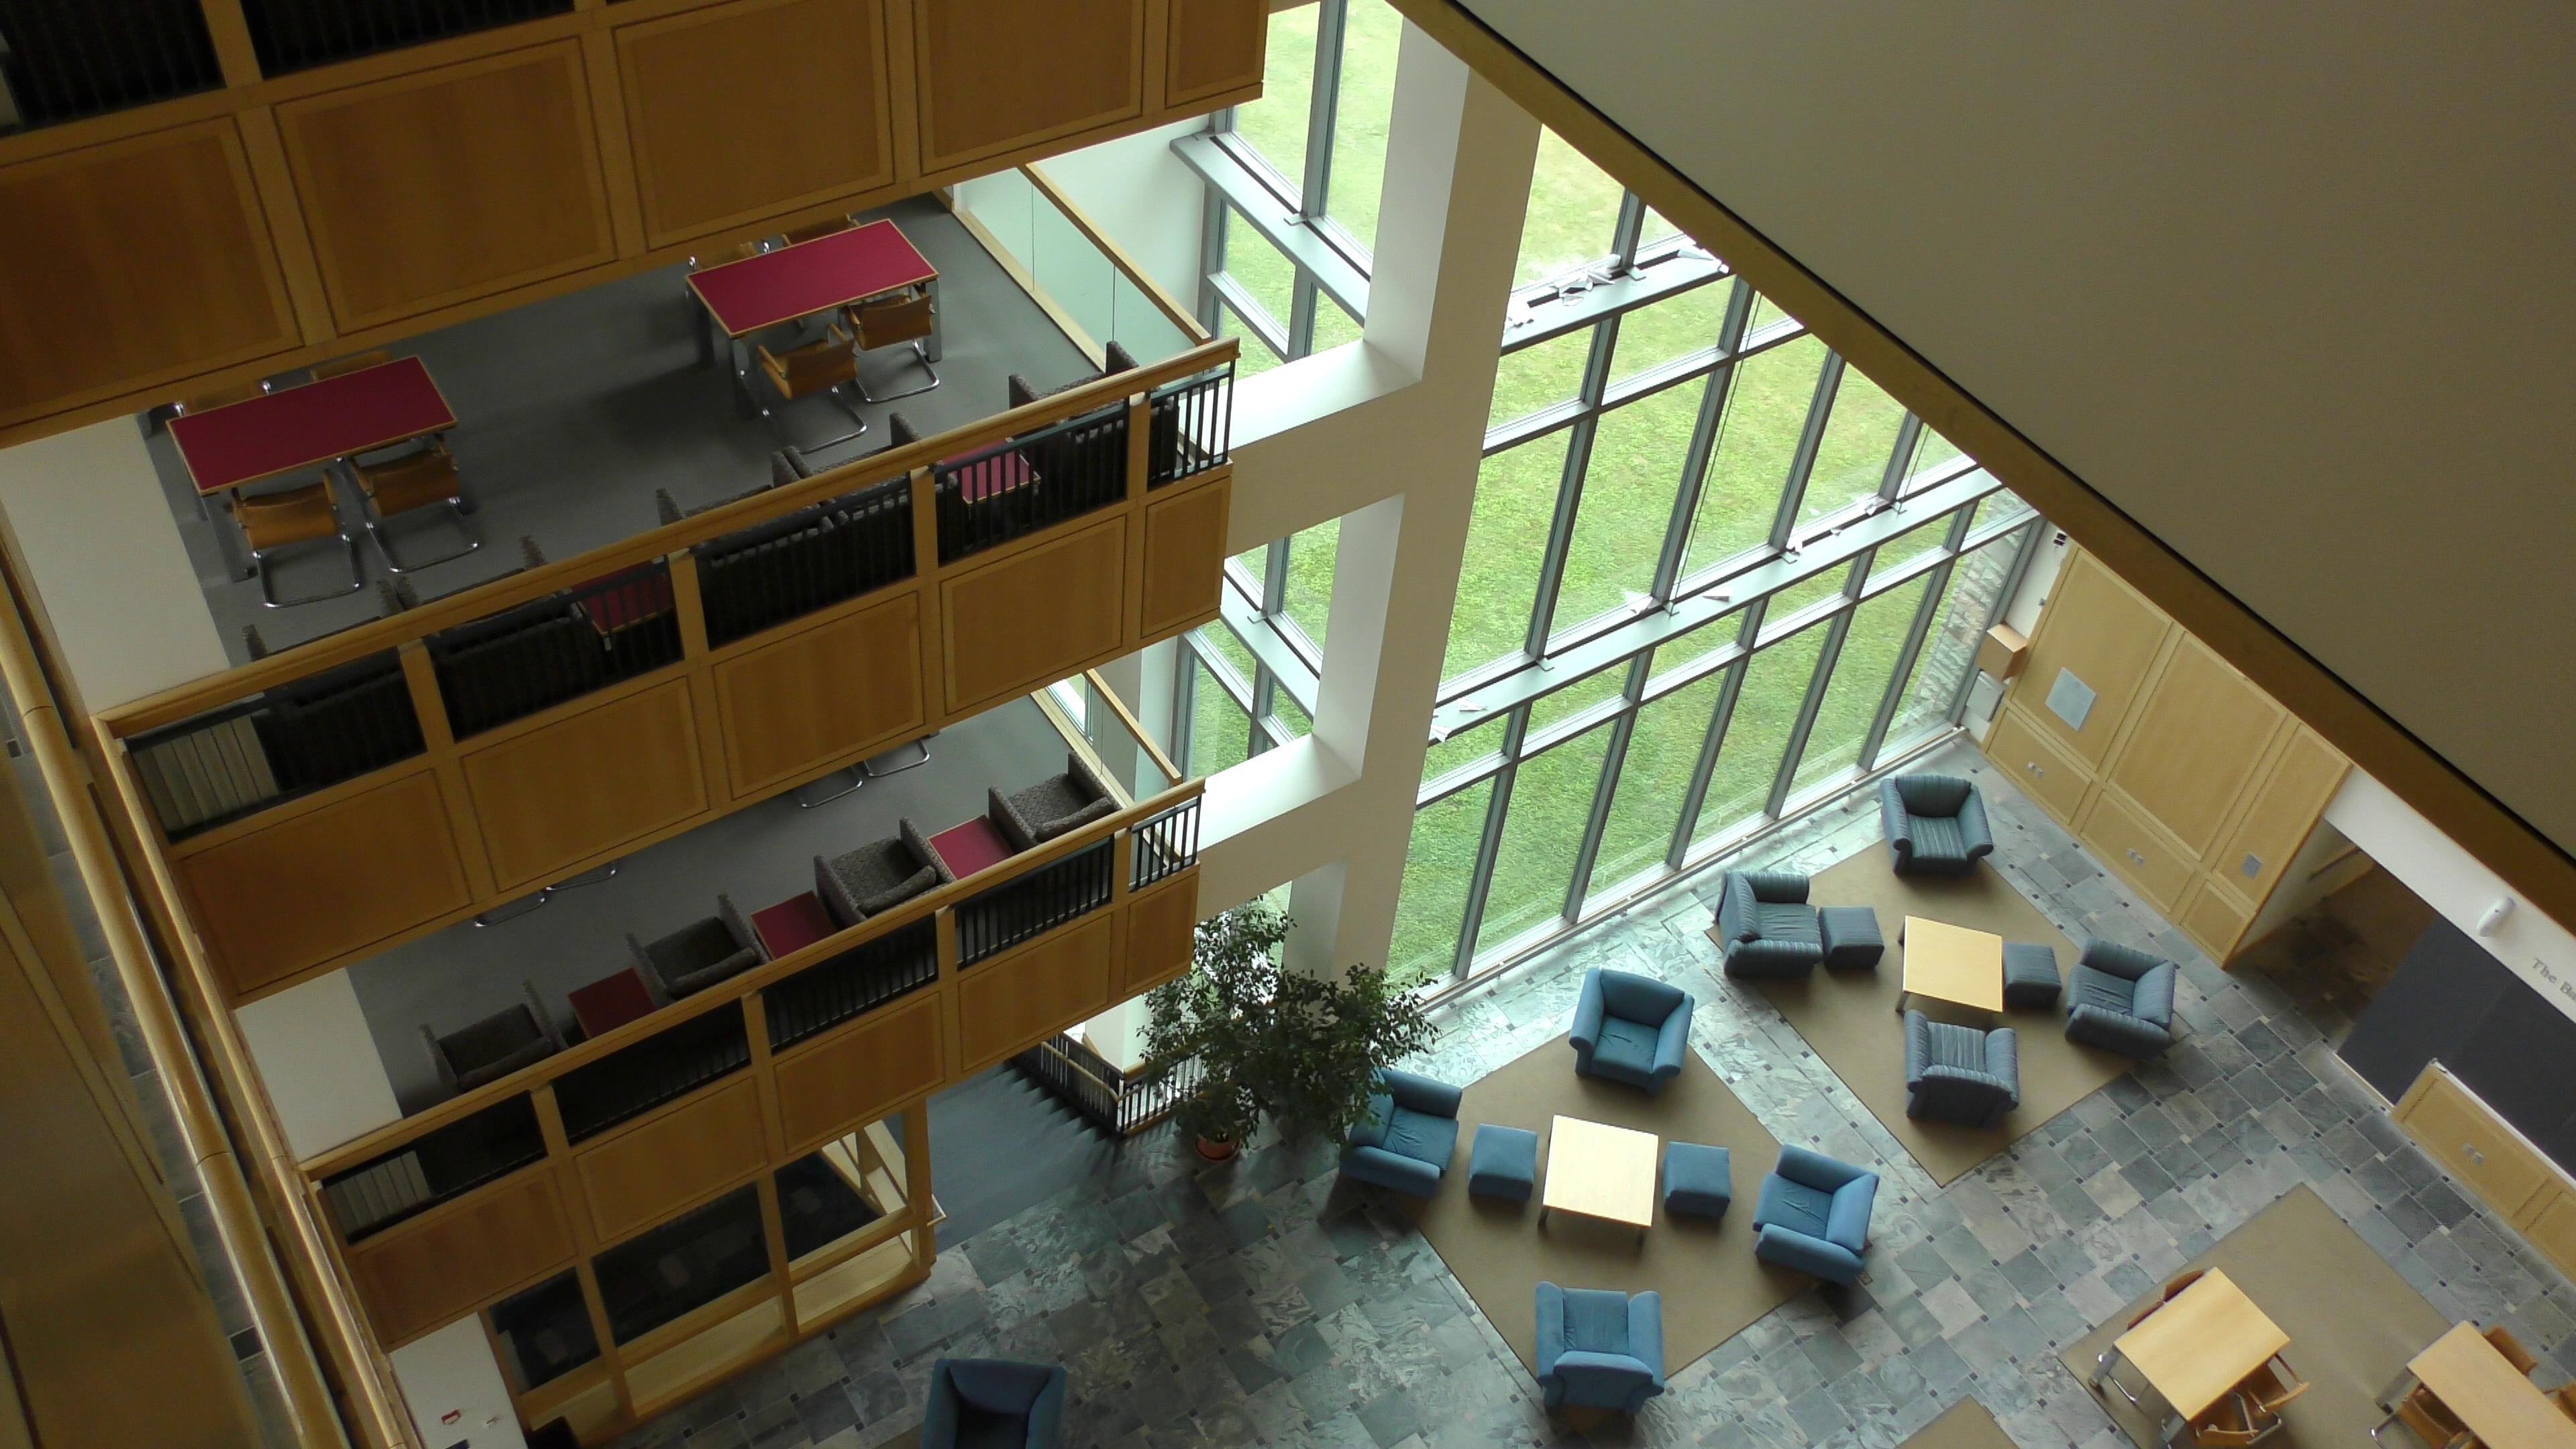 File:Bicentennial Hall 1999 10.jpg - Wikimedia Commons